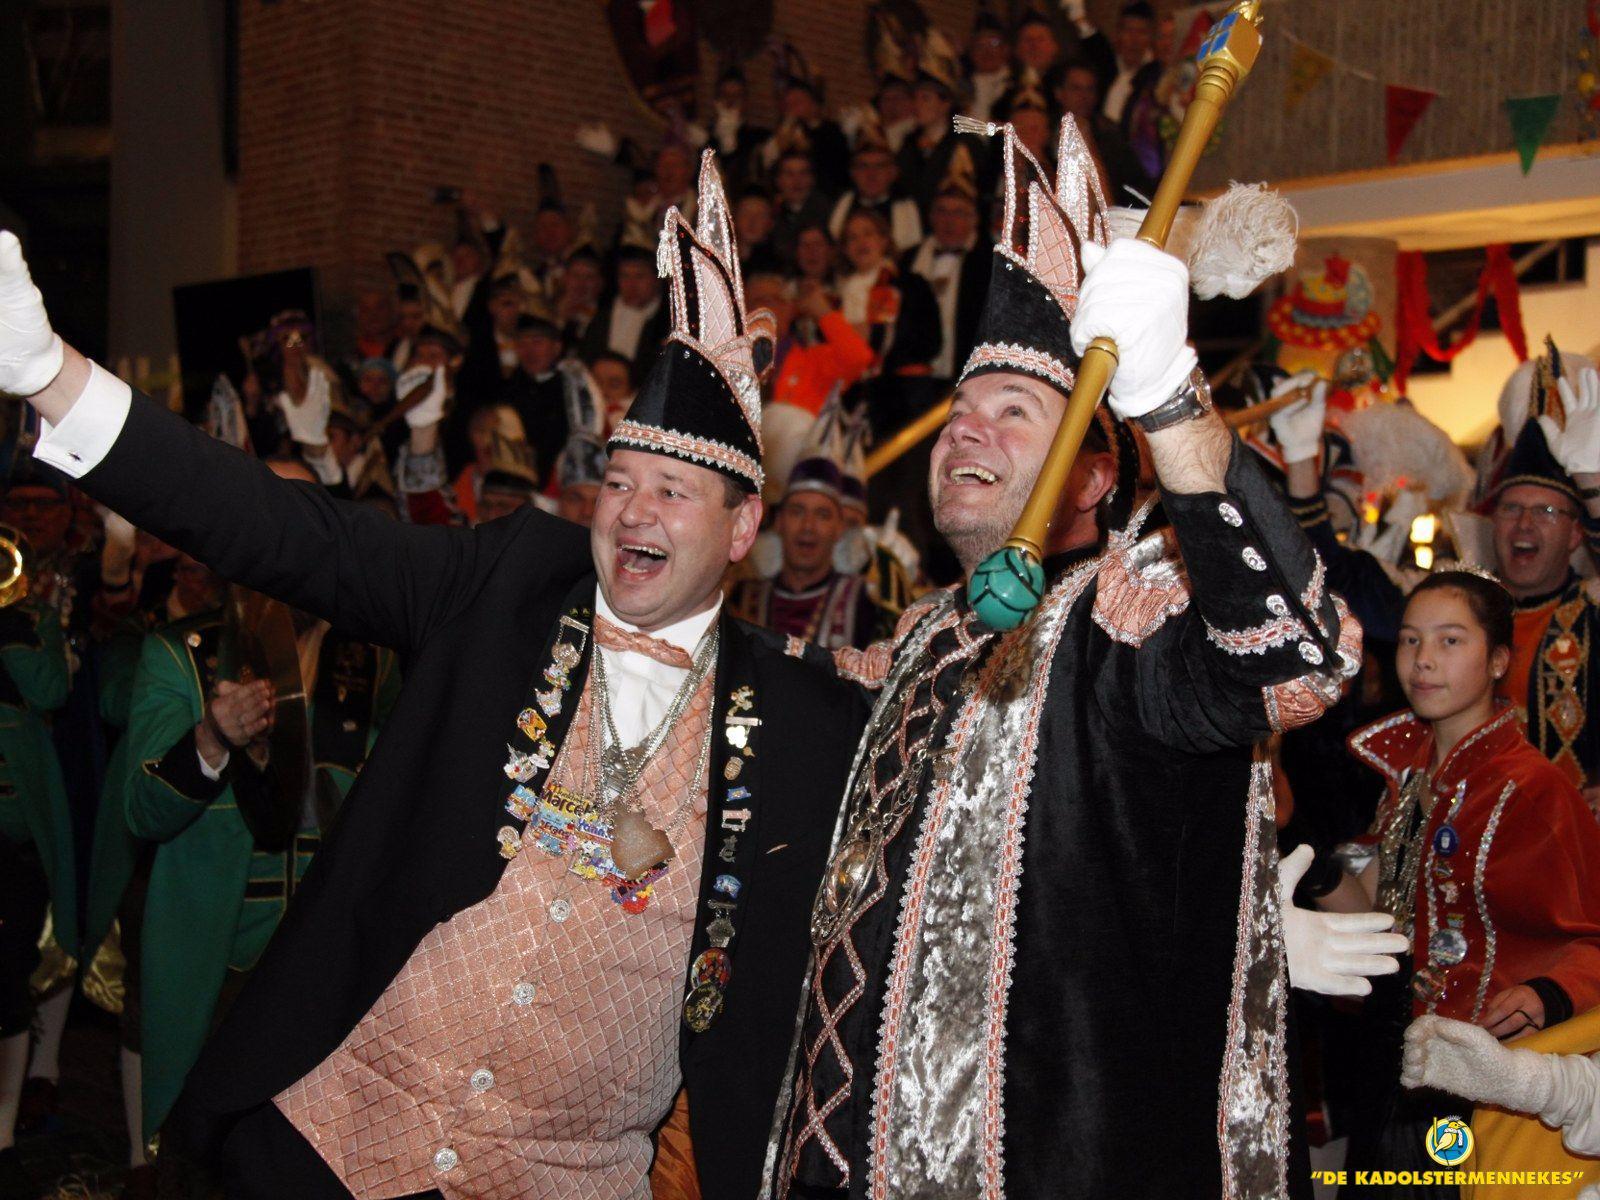 Einde van het Carnavalsweekend, Bokverbranden